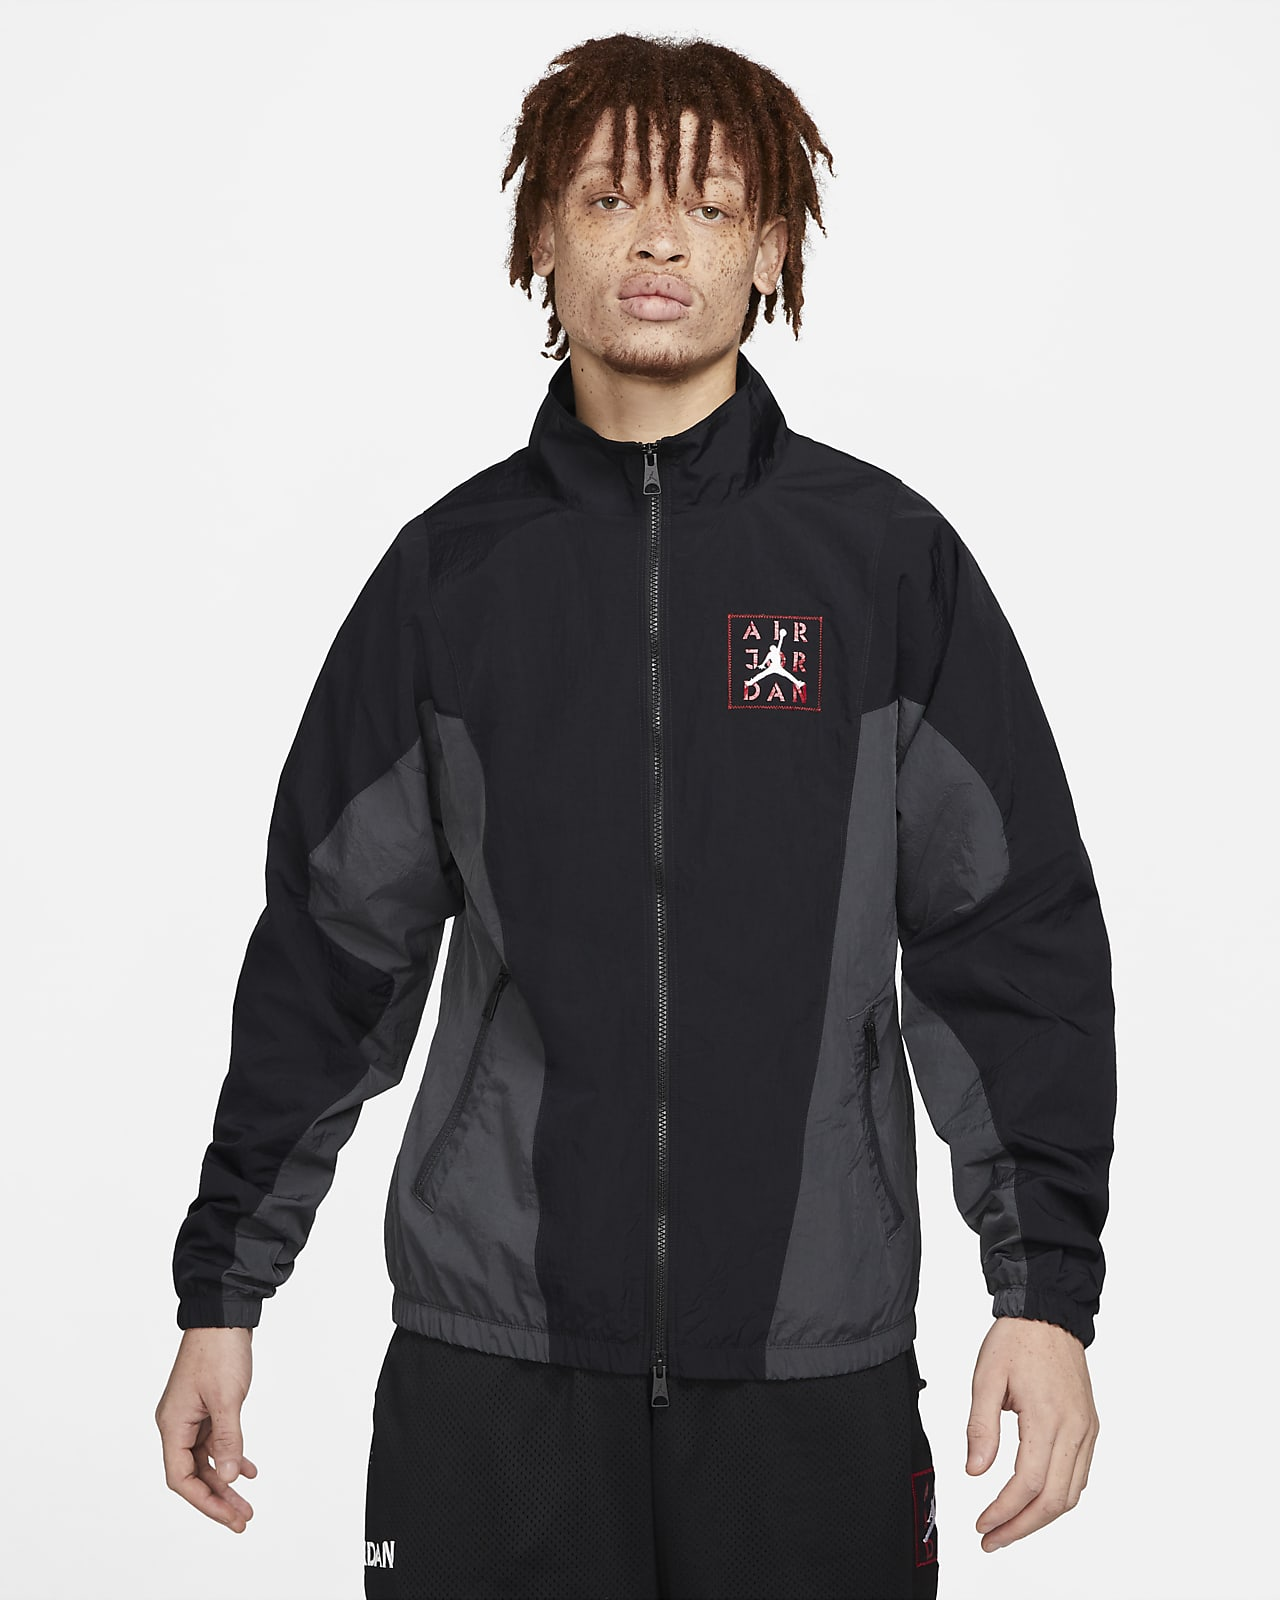 Jordan AJ5 Men's Jacket